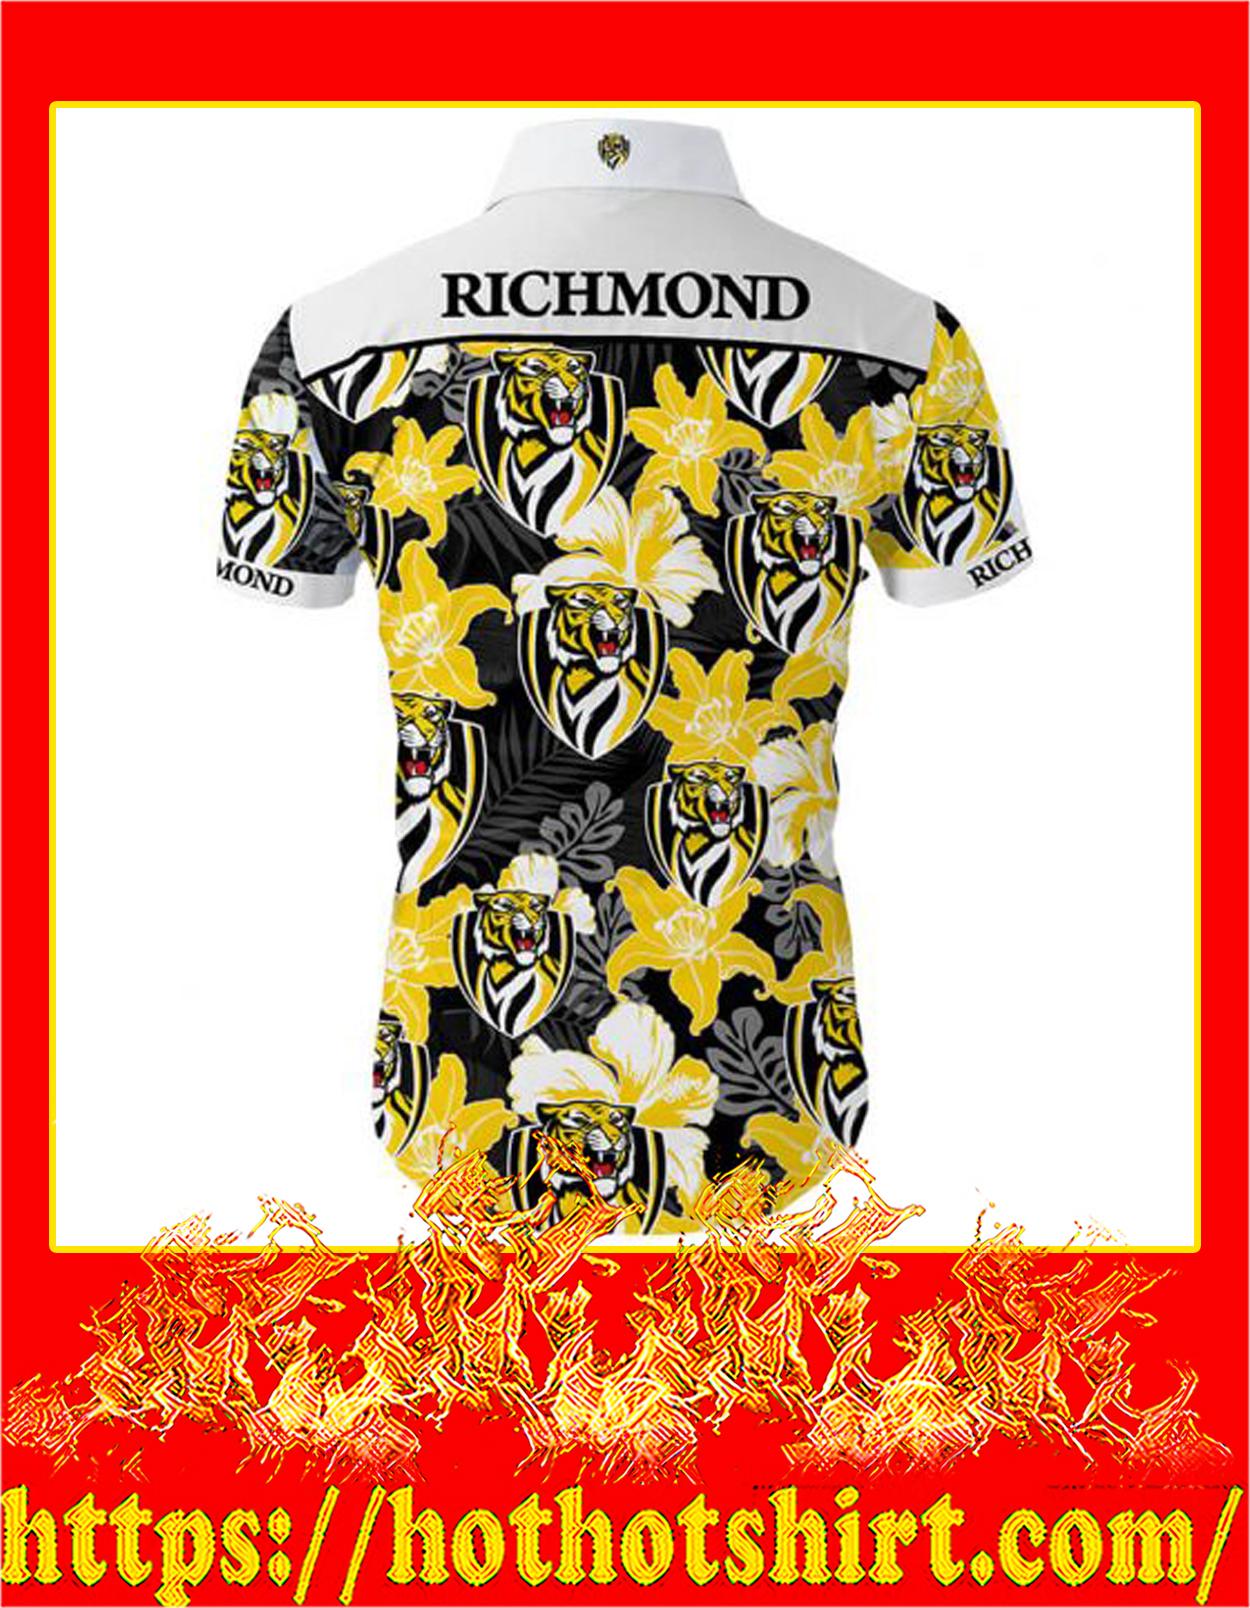 Richmond football club hawaiian shirt - back